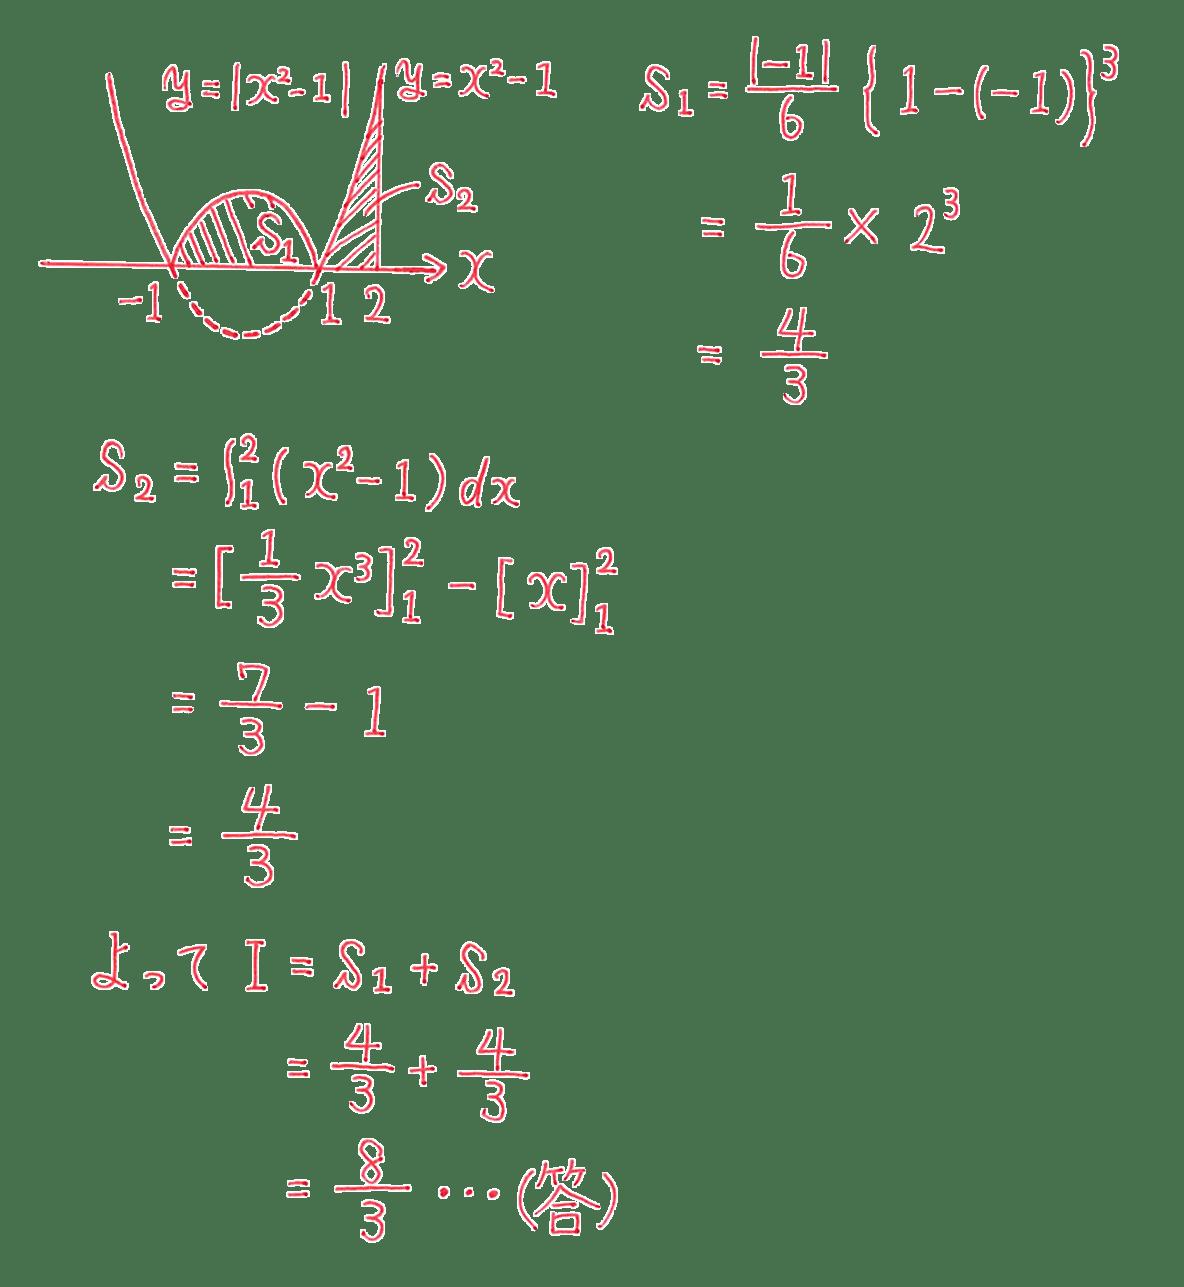 高校数学Ⅱ 微分法と積分法30 練習 答え